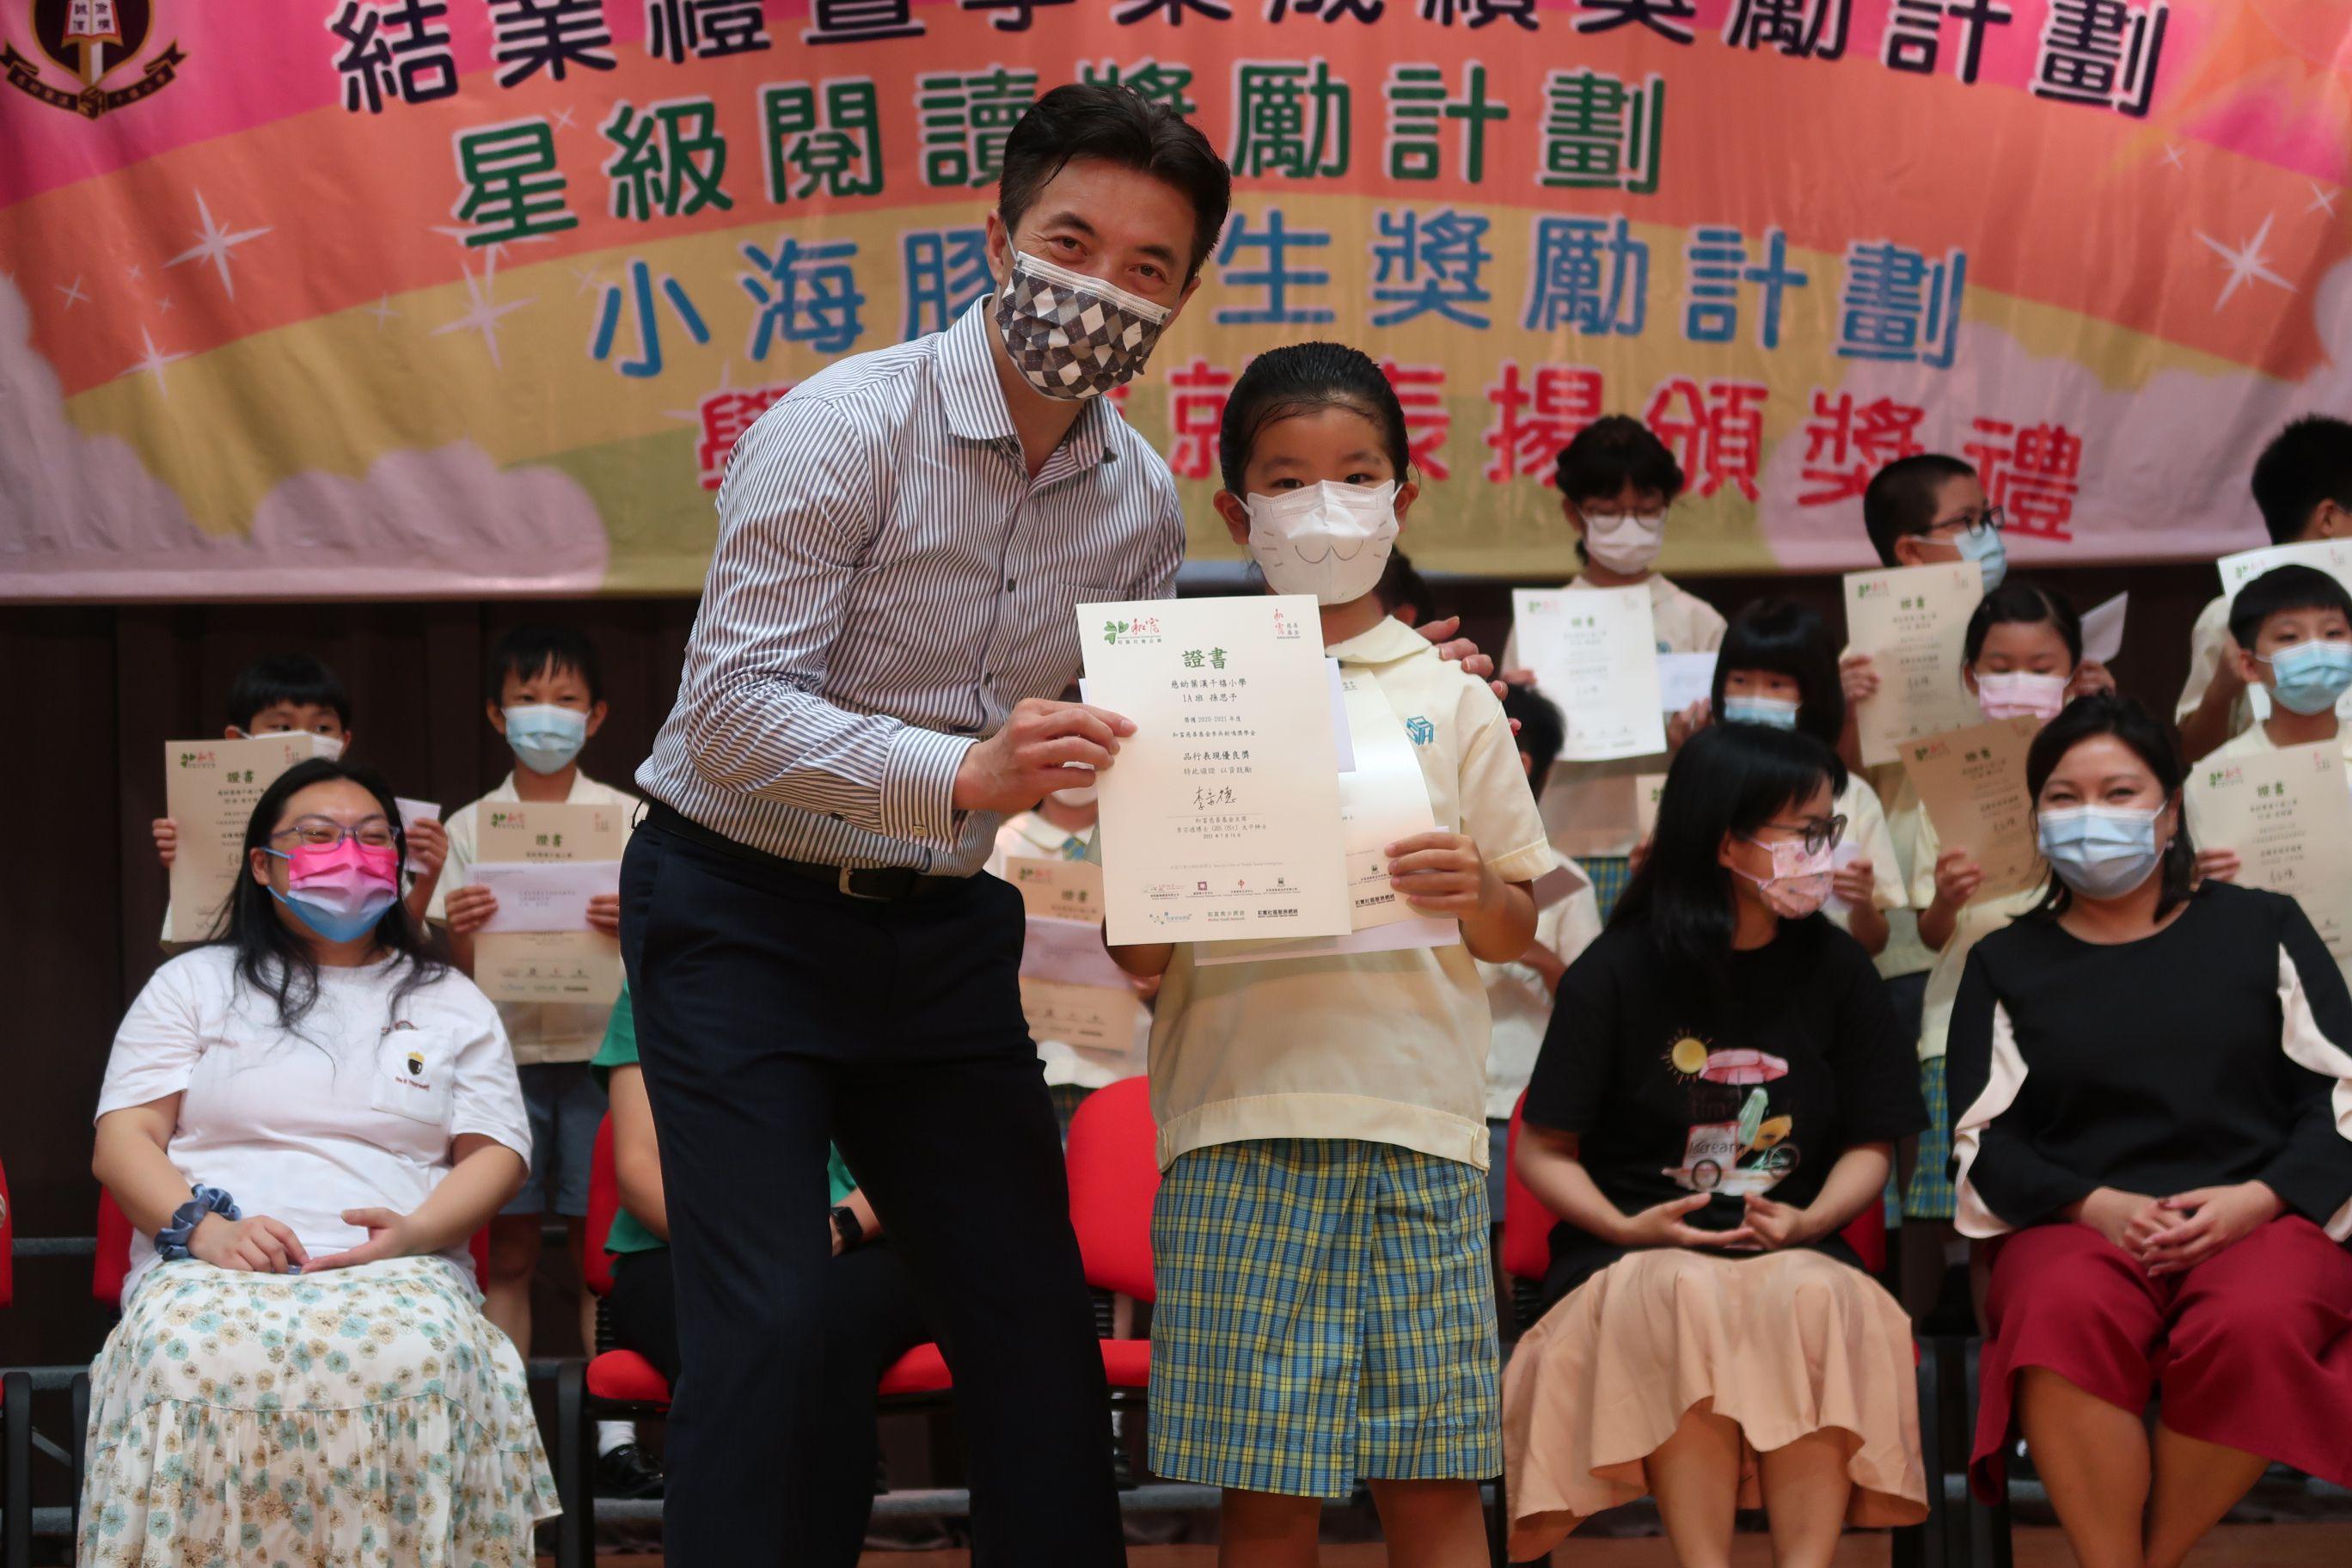 https://syh.edu.hk/sites/default/files/img_5948_1.jpg